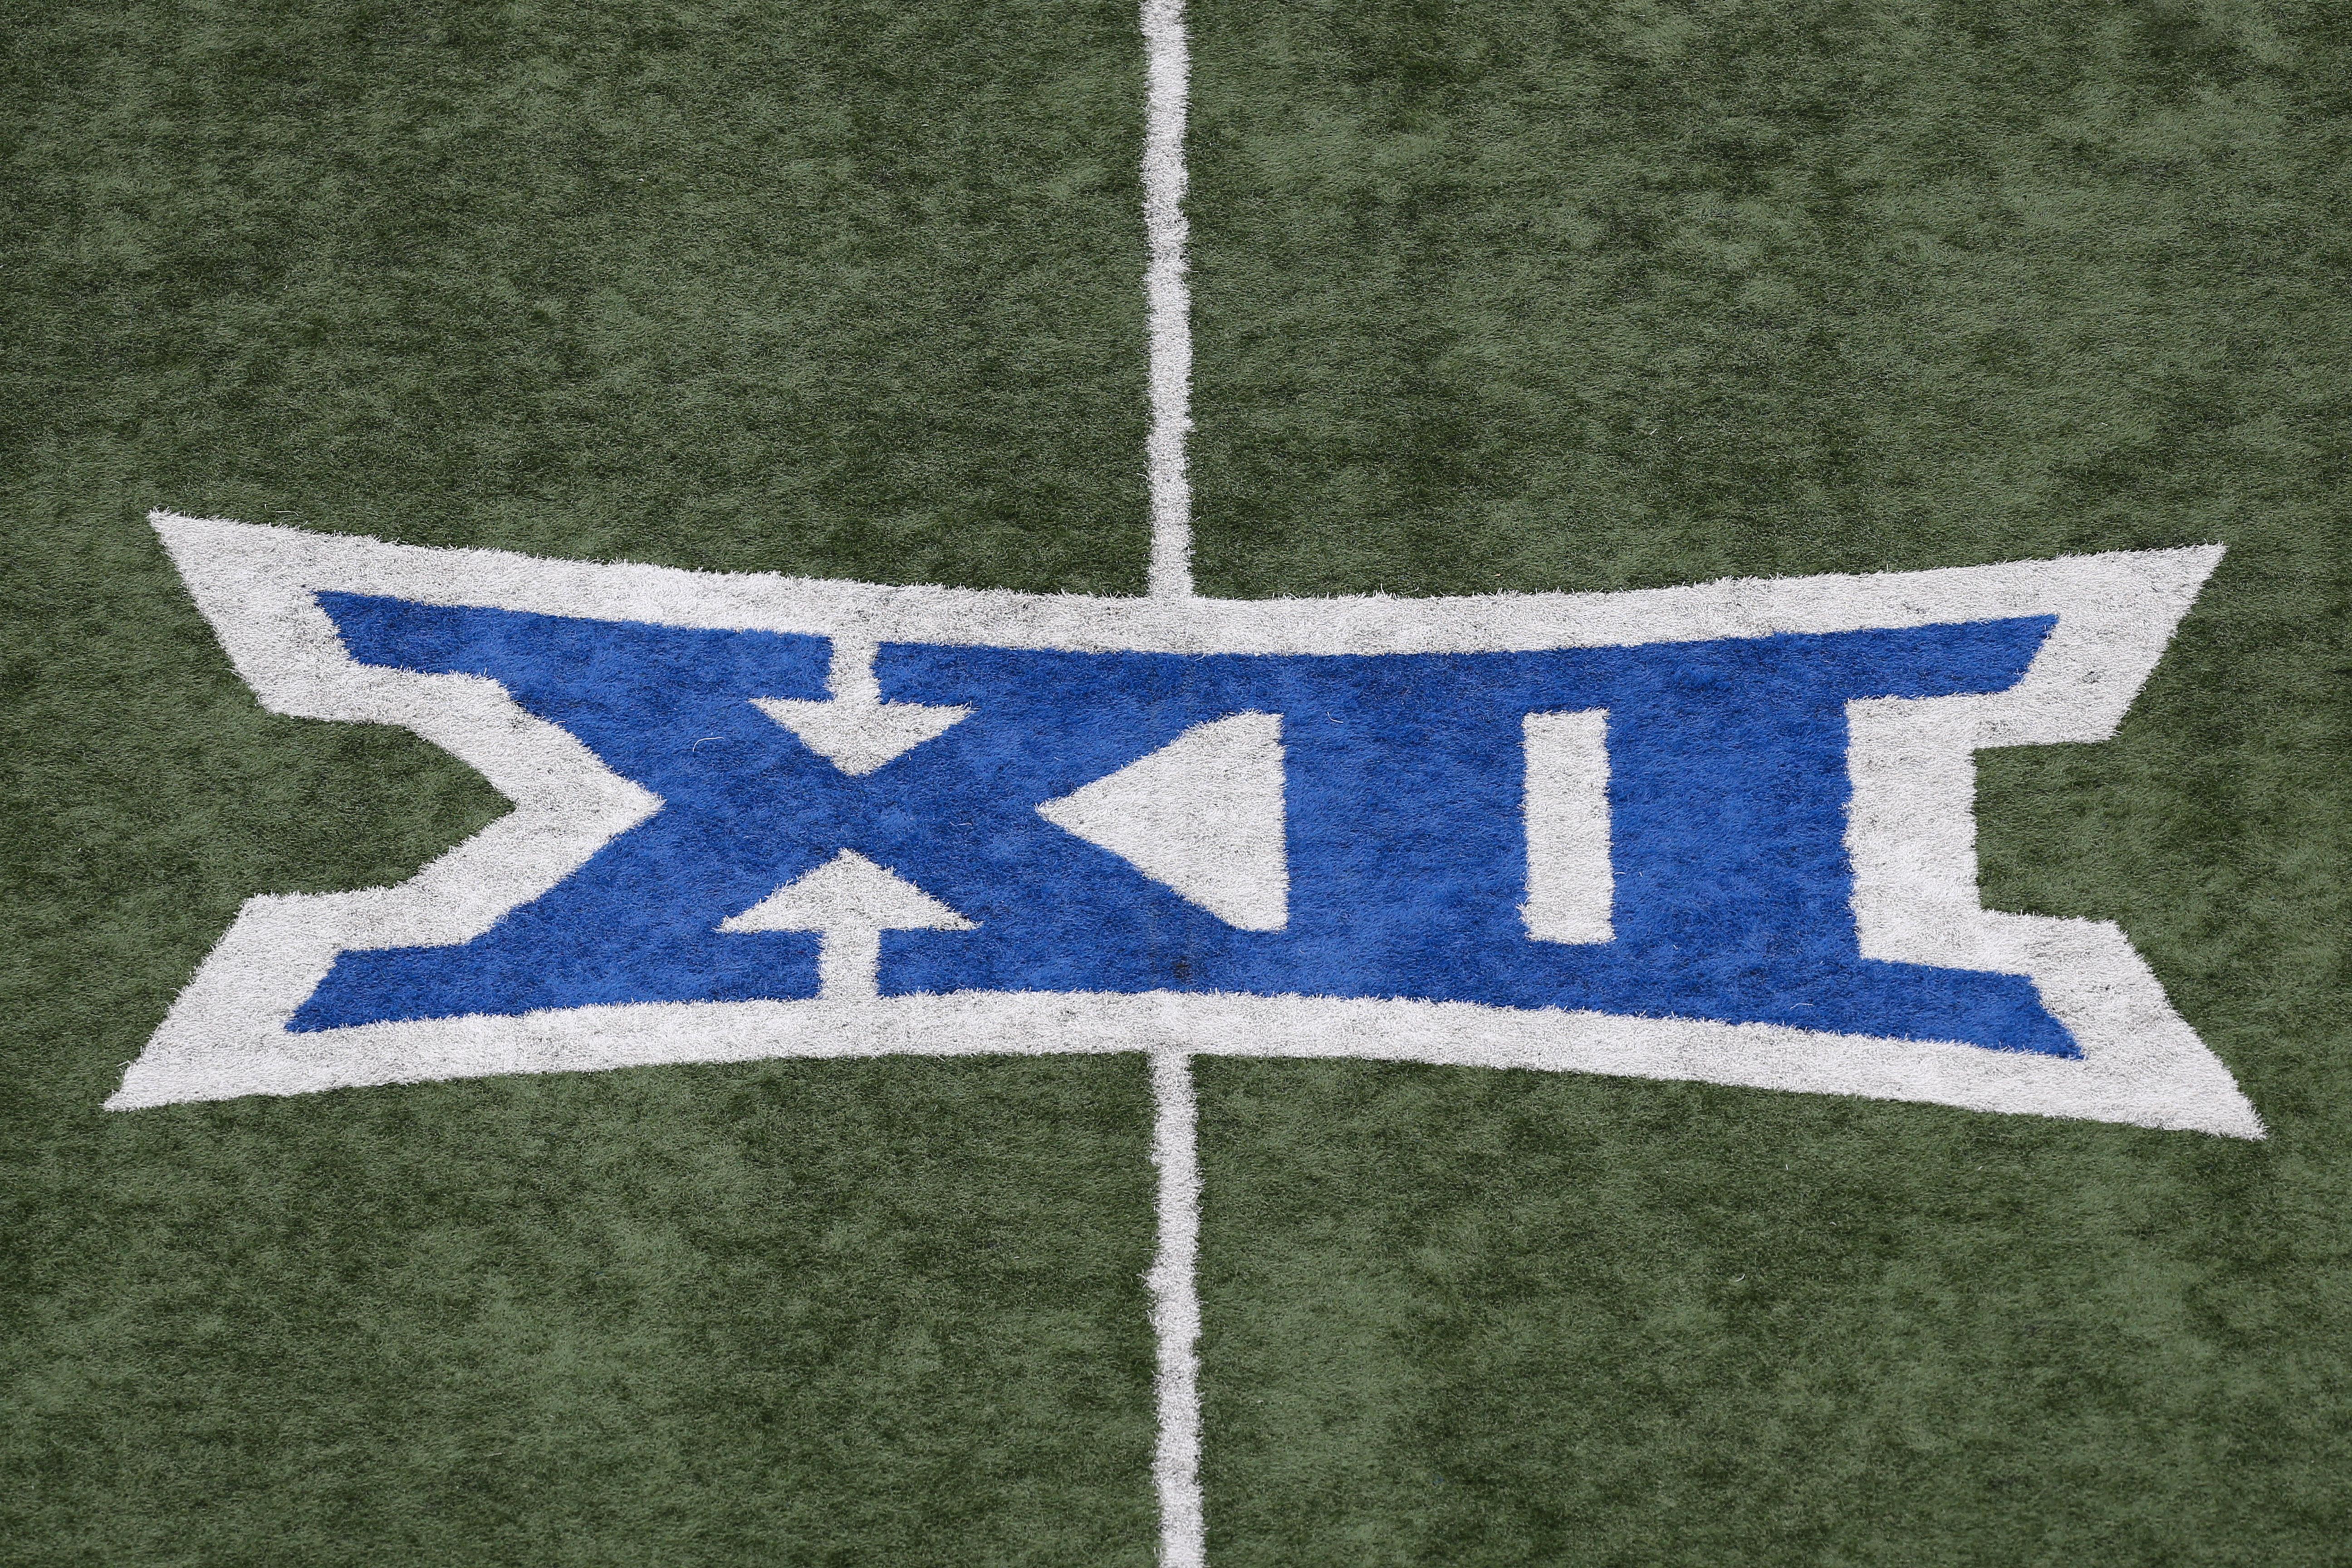 COLLEGE FOOTBALL: NOV 23 Texas at Kansas